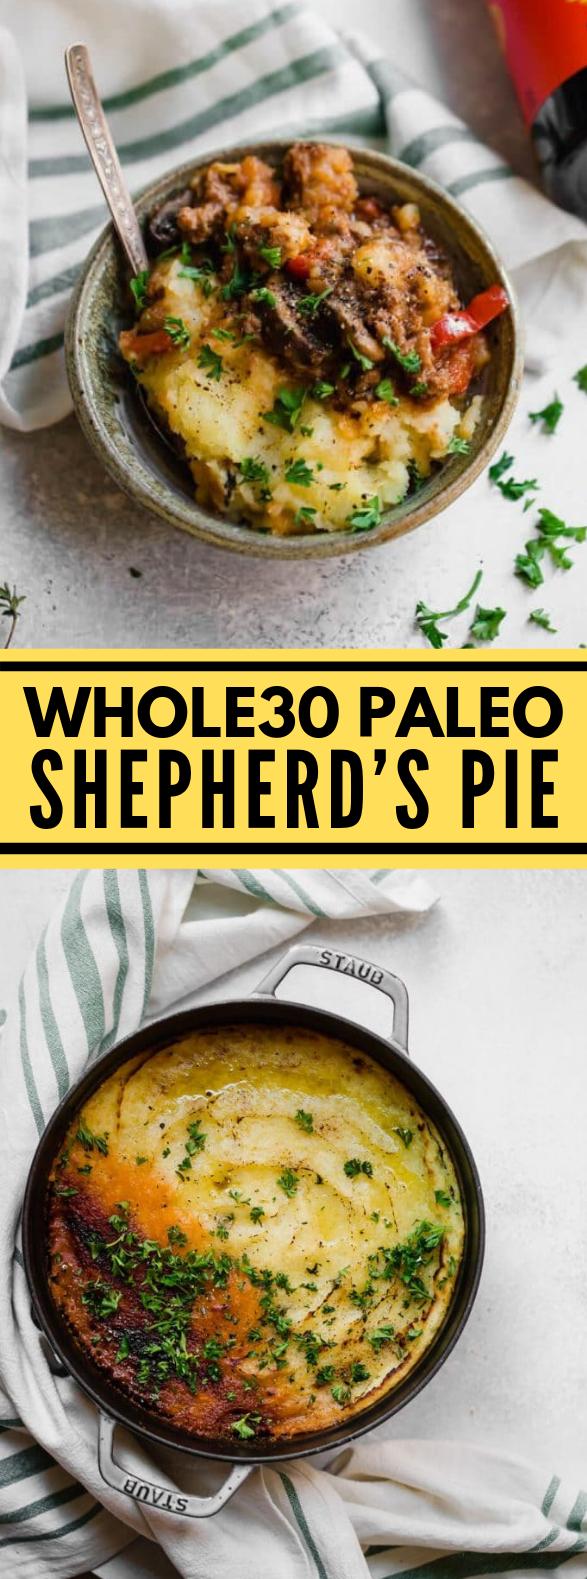 WHOLE30 PALEO SHEPHERD'S PIE #diet #comfortfood